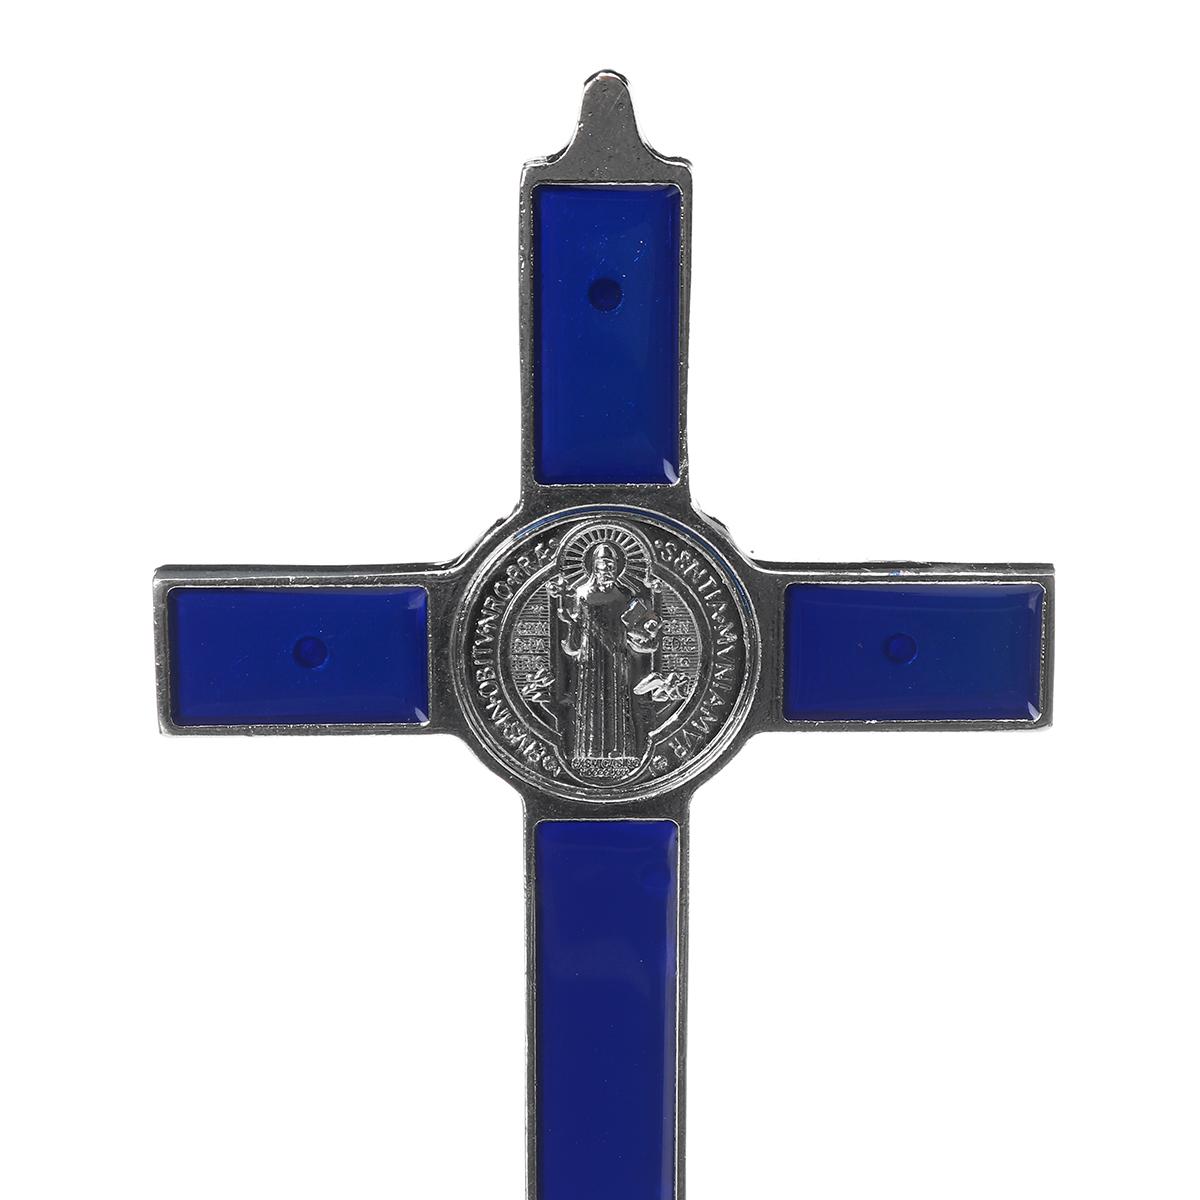 Antique Crucifix Wall Cross Jesus Christ INRI Wall Decor Catholic Cross Ornament